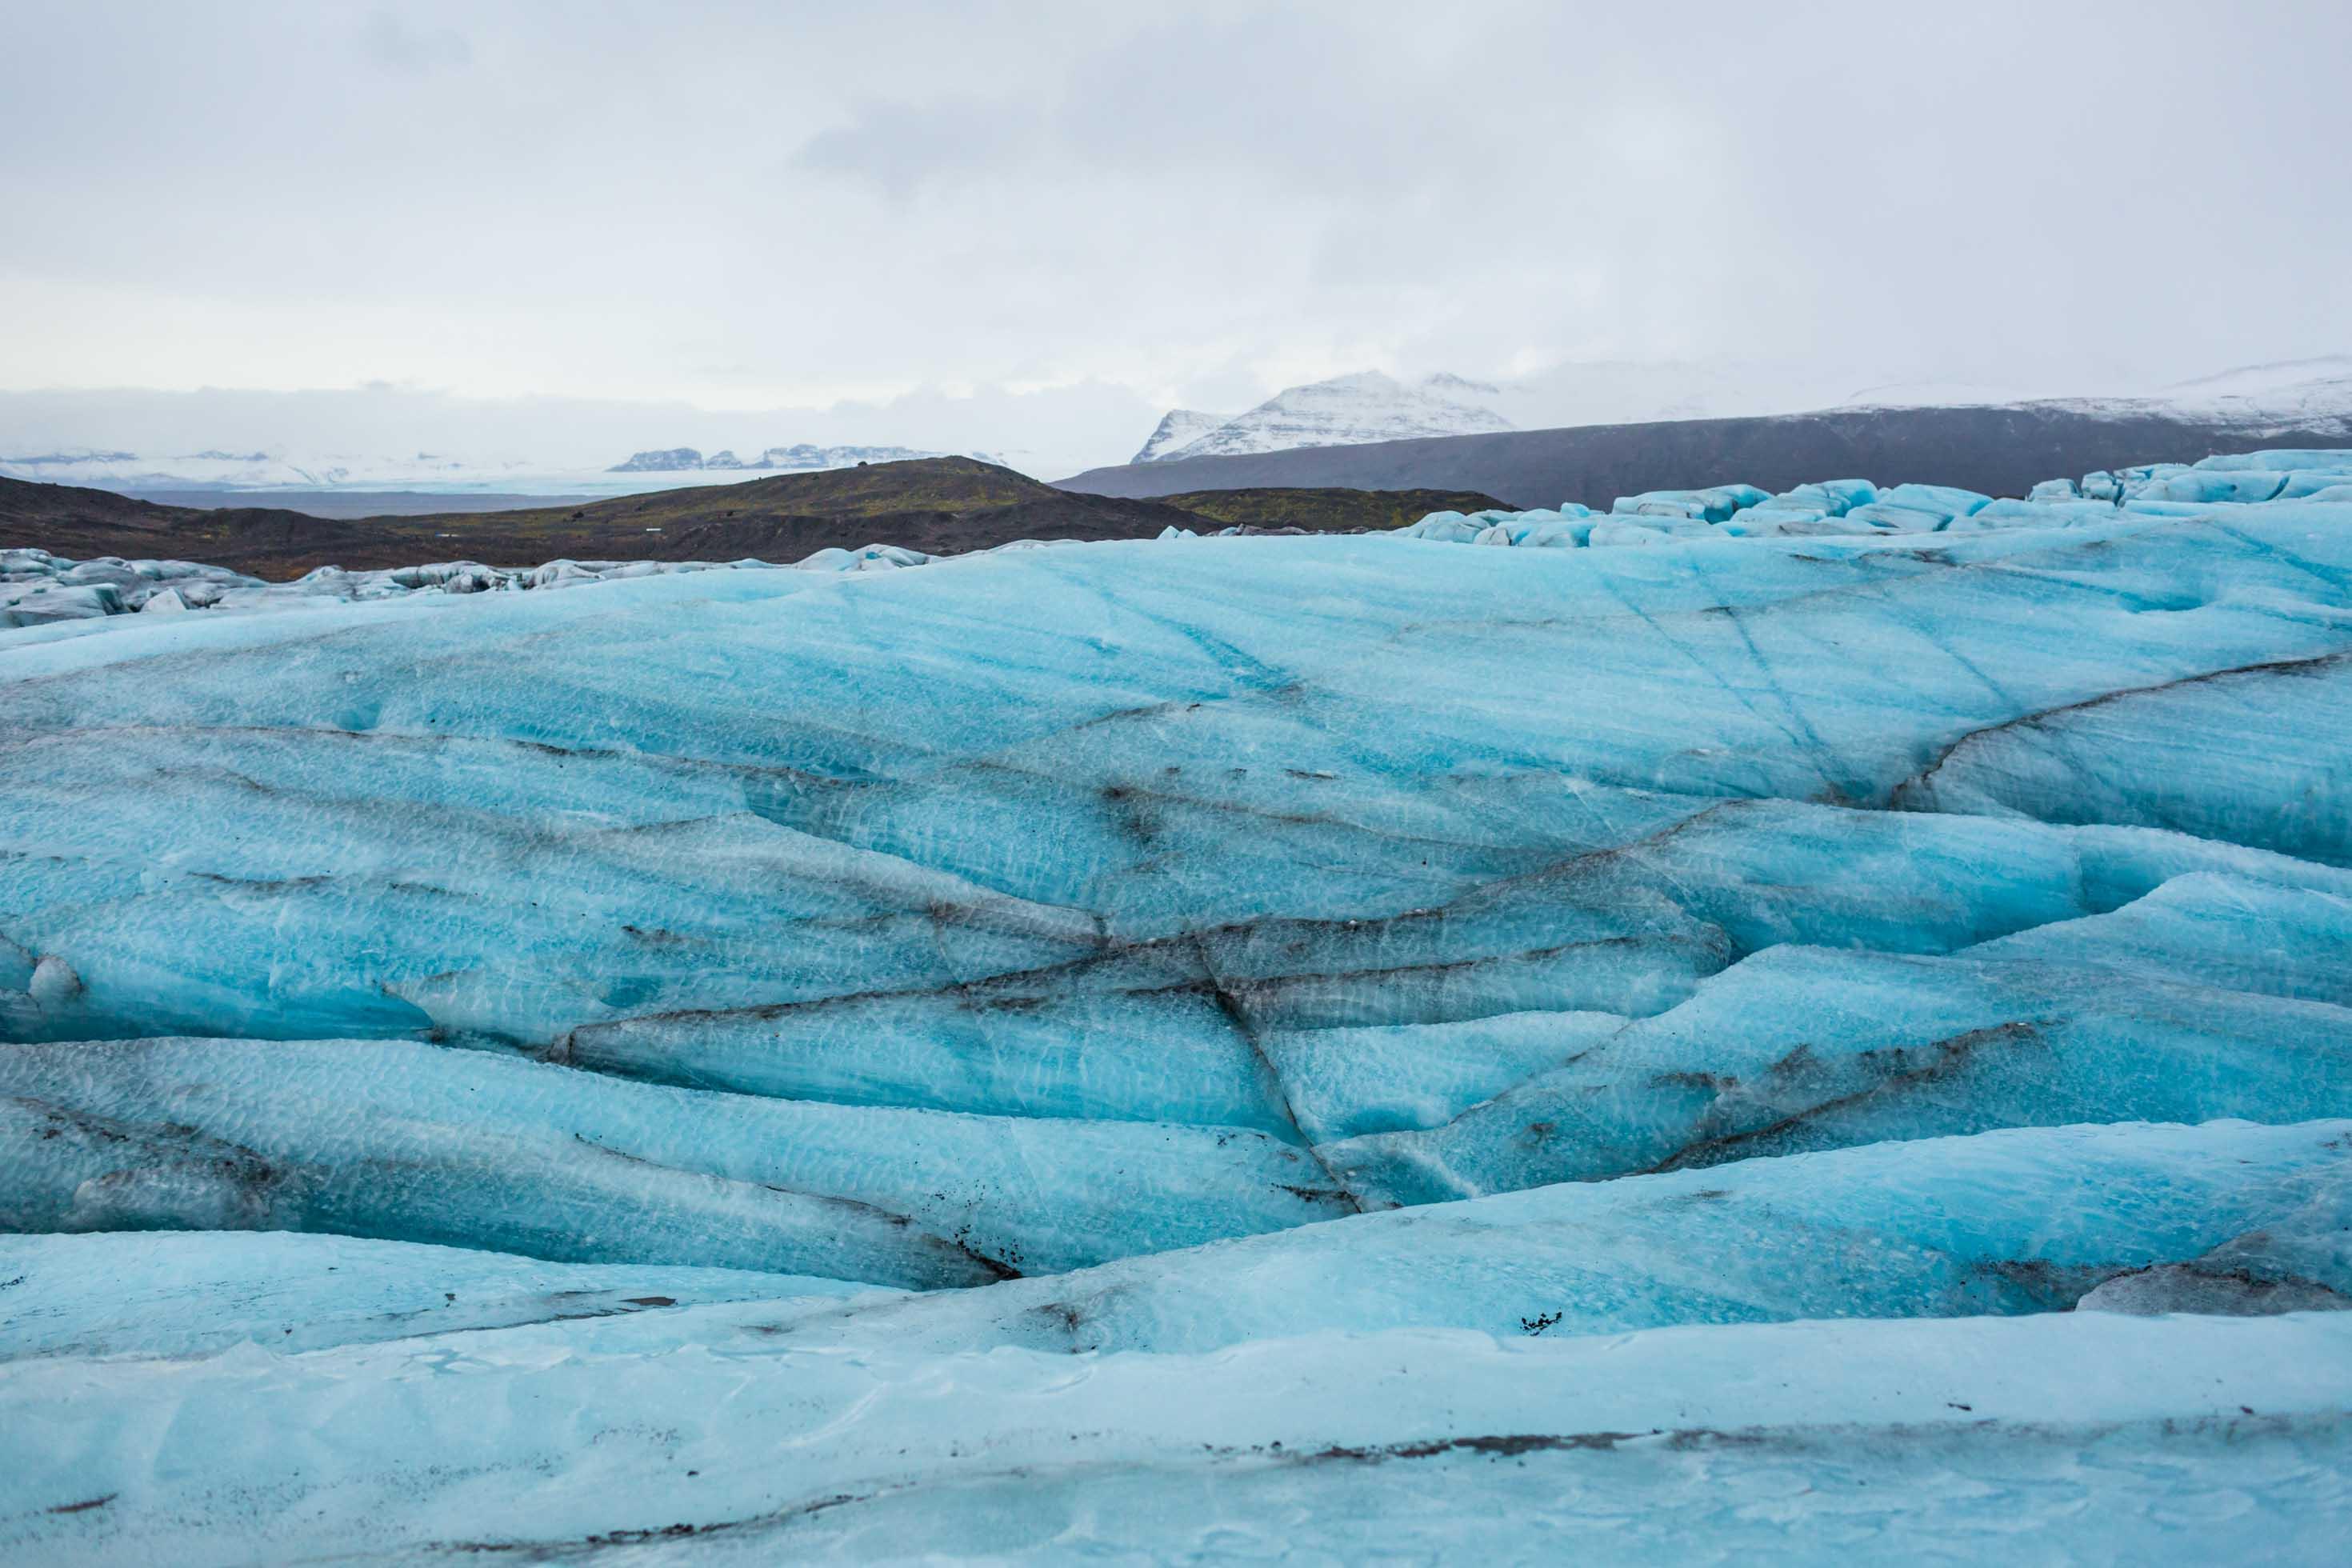 Breiðamerkurjökull glacier - Pictures of glaciers in Iceland.